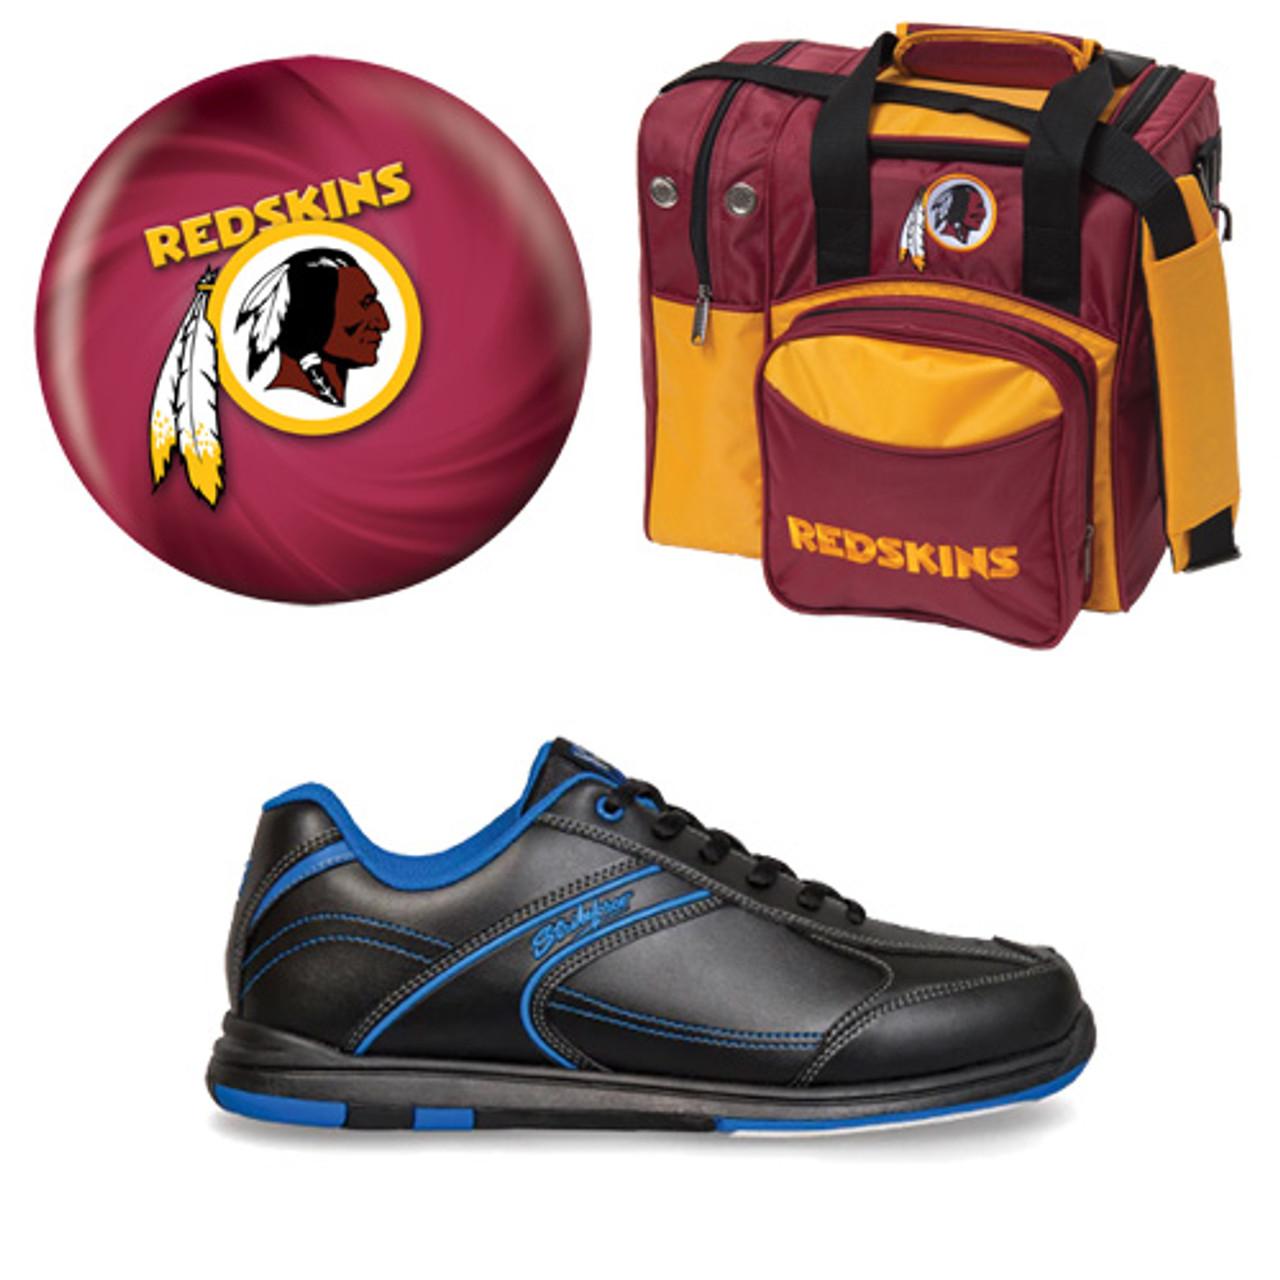 ceab9e30 Washington Redskins Ball, Bag and Shoes Mens Package